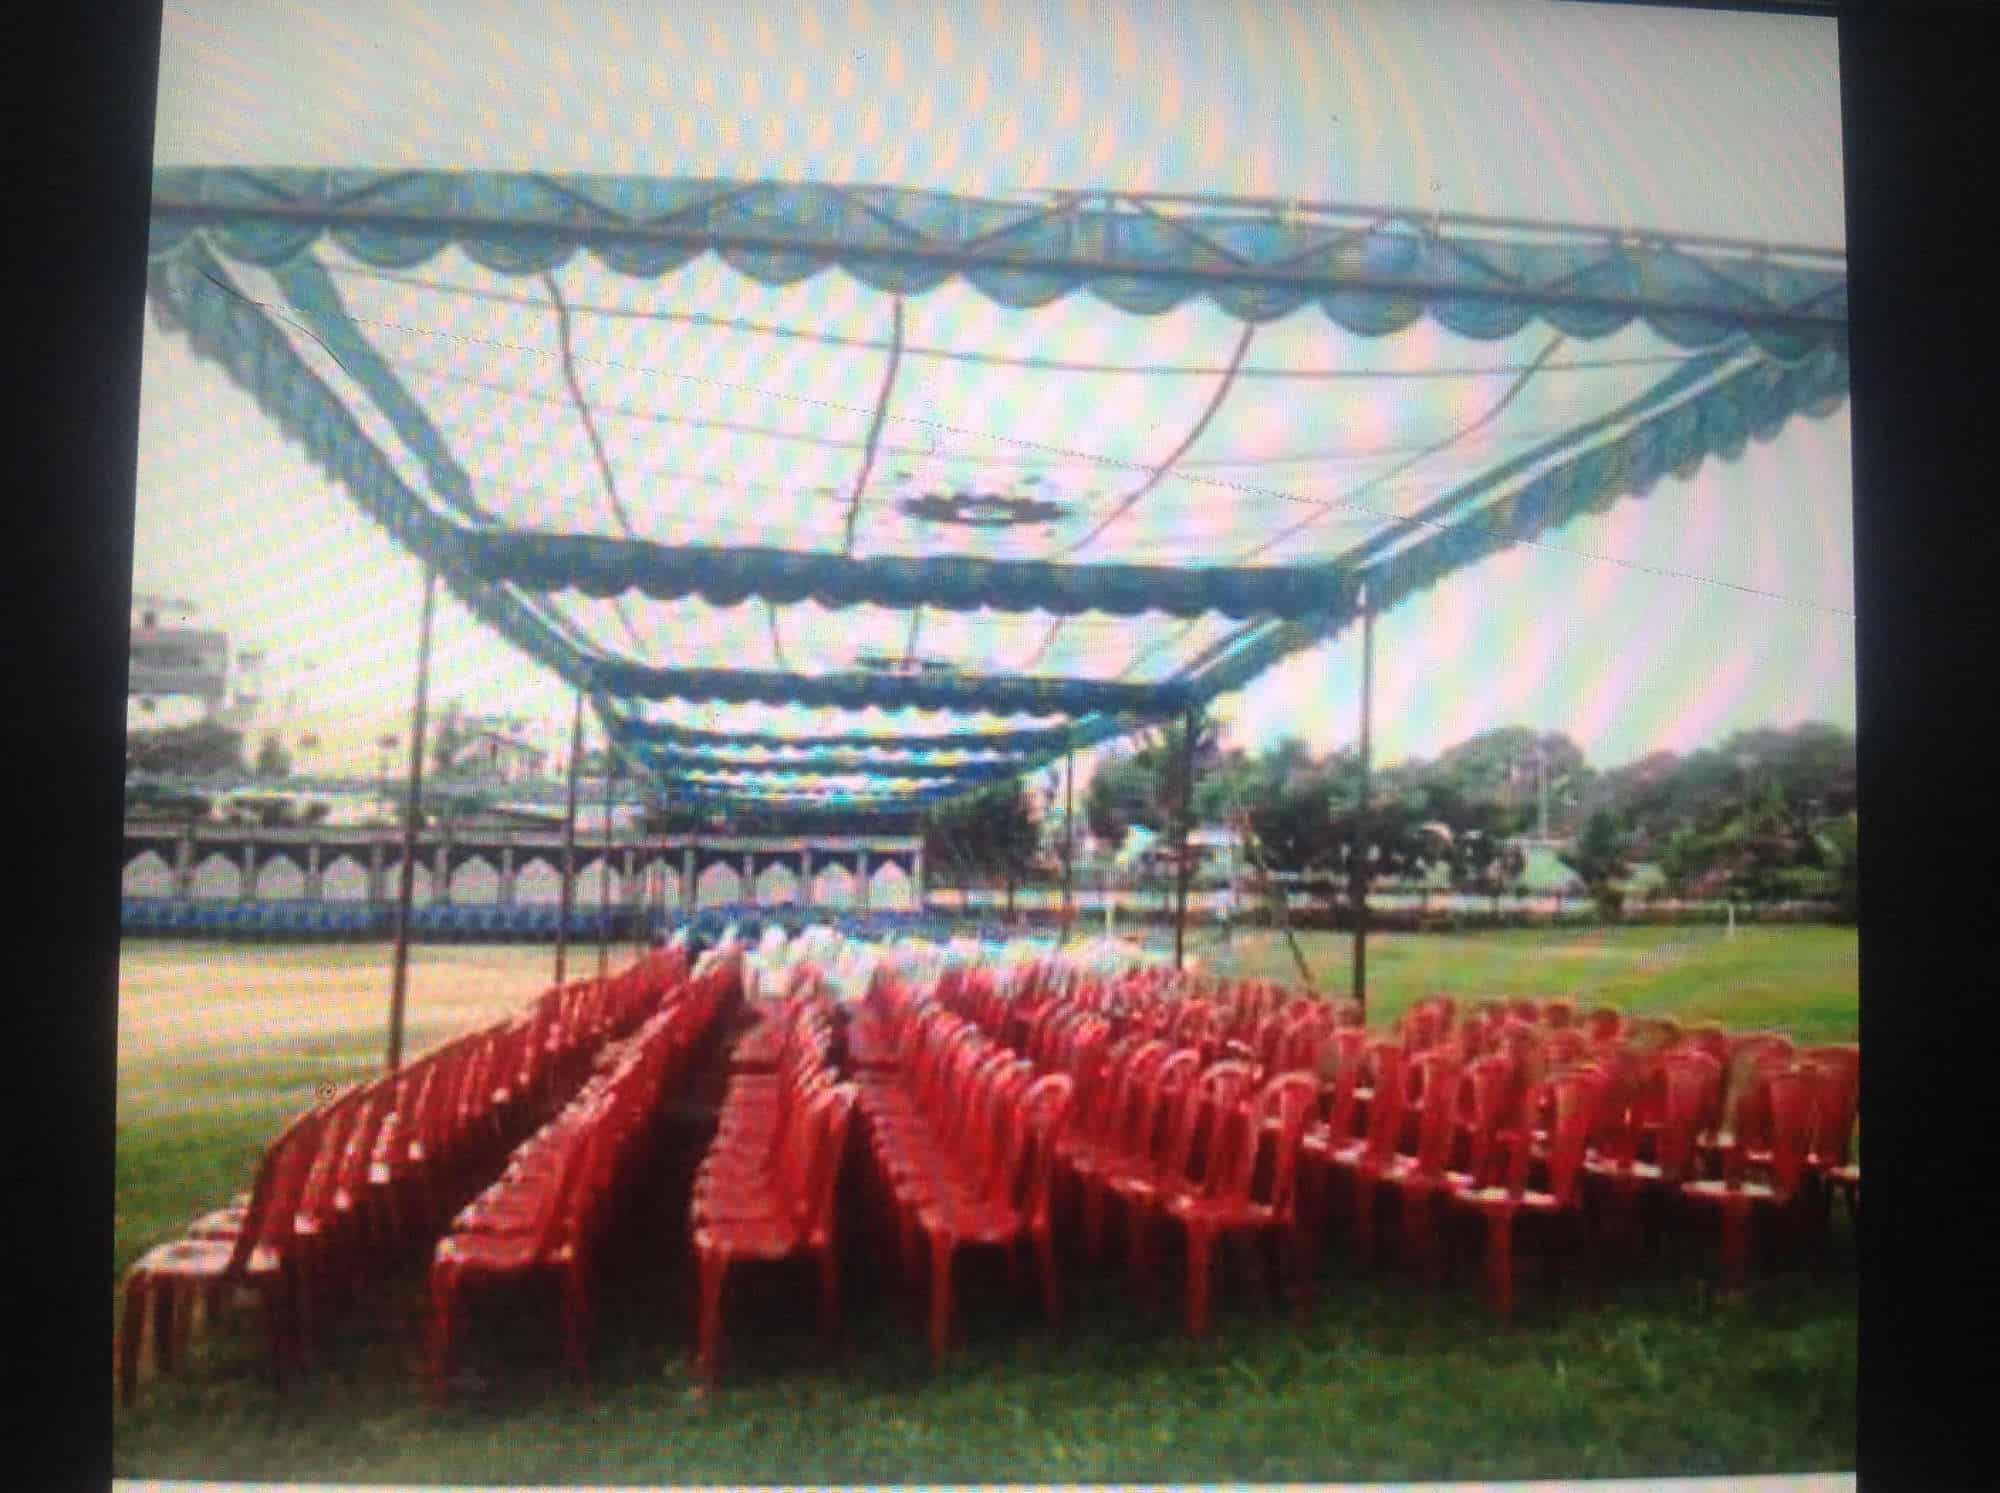 Sai Tent House & Sai Tent House Malleswaram - Tent House in Bangalore - Justdial